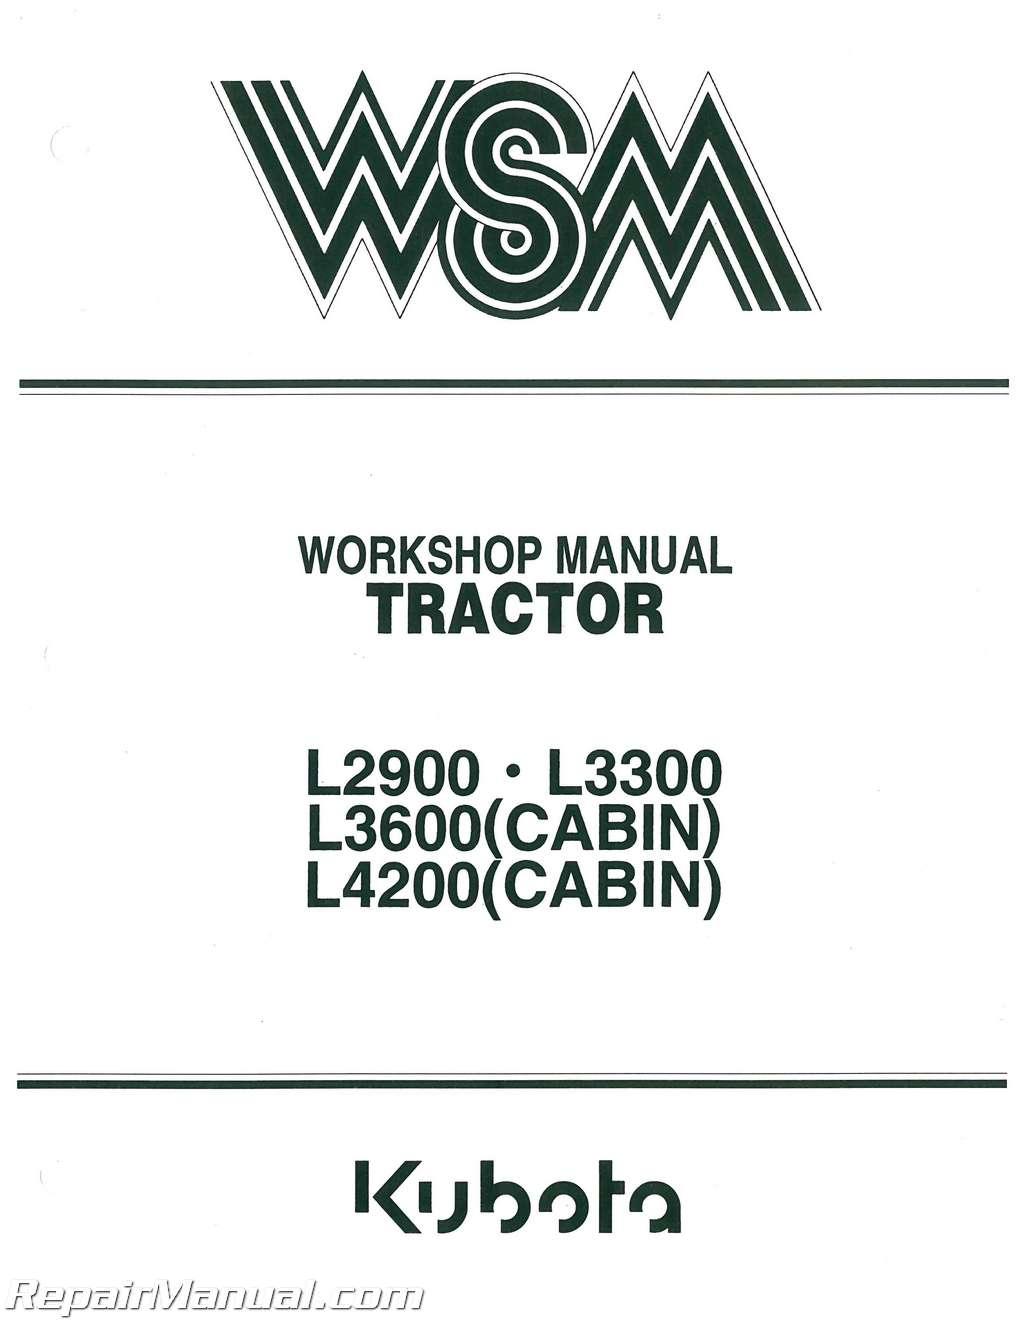 kubota l2900 l3300 l3600 l4200 diesel 2 4wd tractor service manual rh repairmanual com kubota workshop manual for svl75 kubota workshop manual m5400